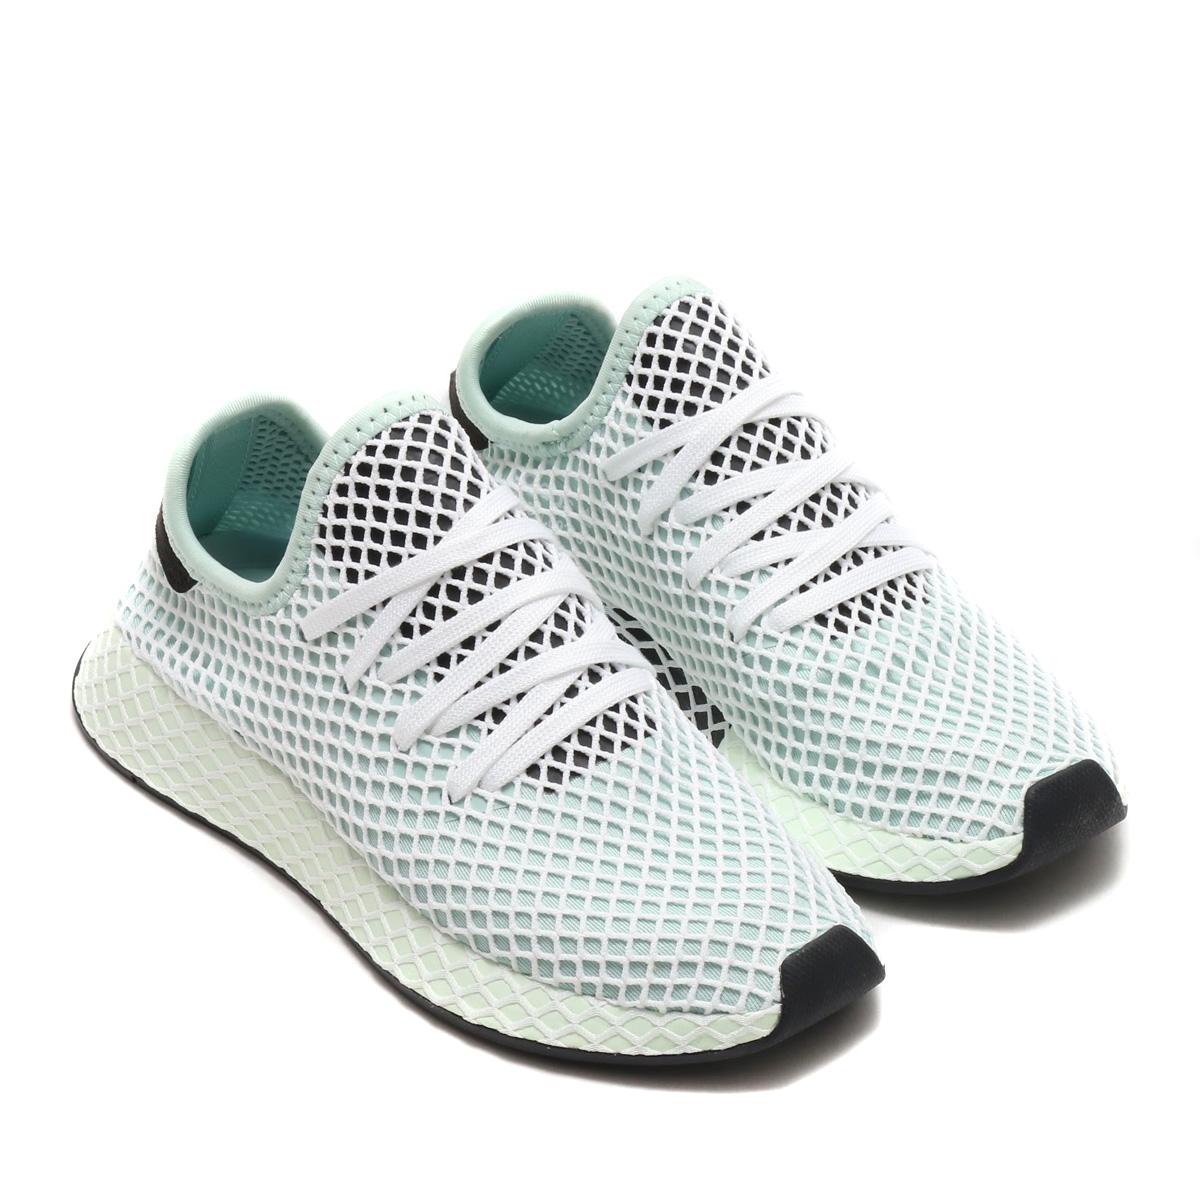 adidas Originals DEERUPT RUNNER W(アディダス オリジナルス ディーラプト ランナー W)(アッシュグリーン S18/アッシュグリーン S18/コアブラック)18SS-I